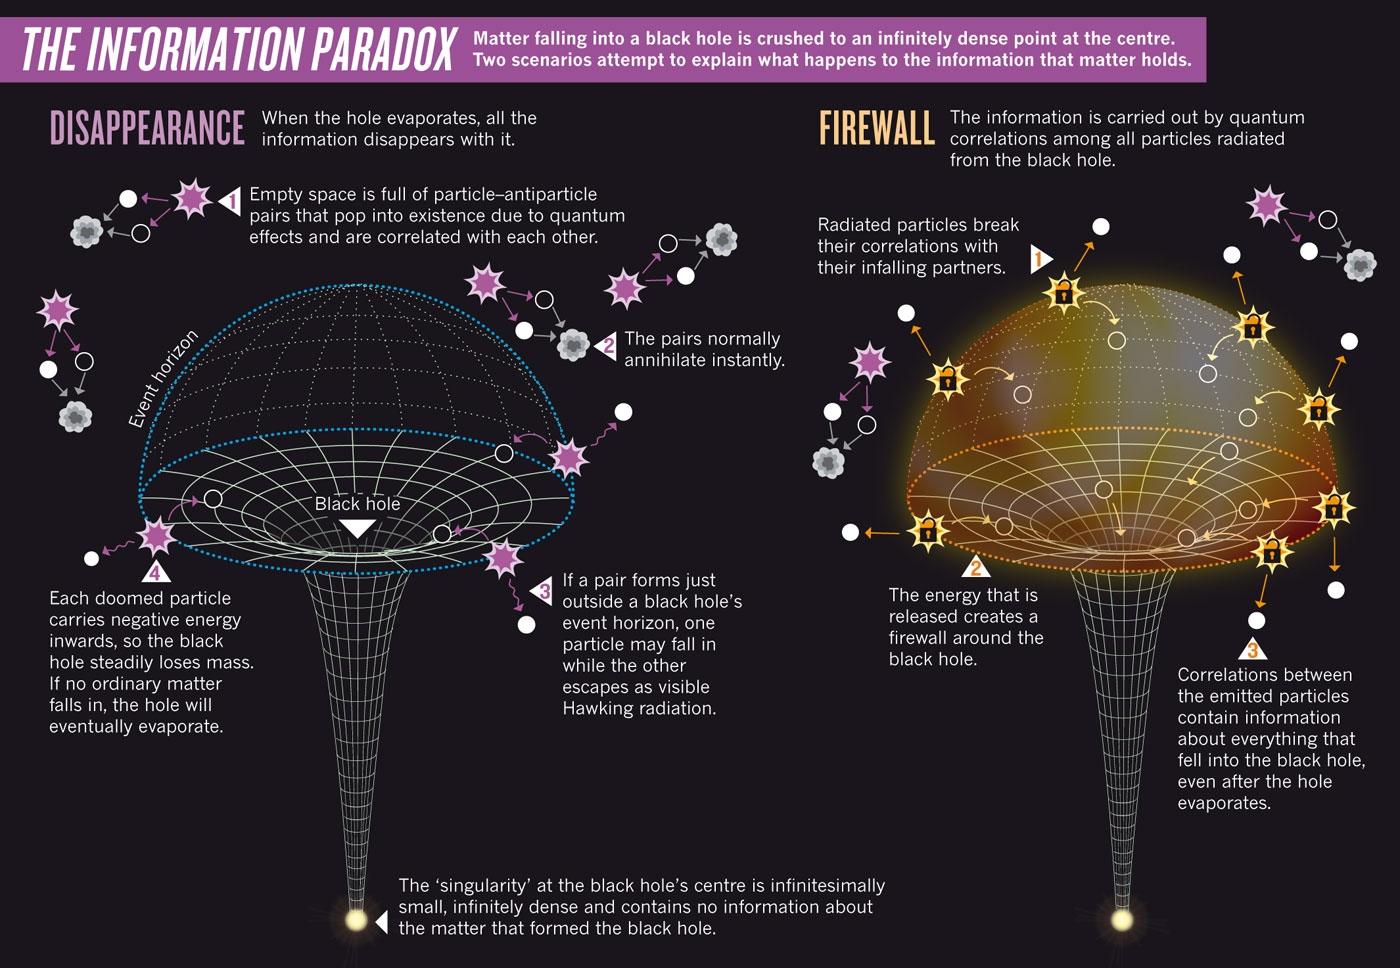 Information Paradox. Nature Publishing Group